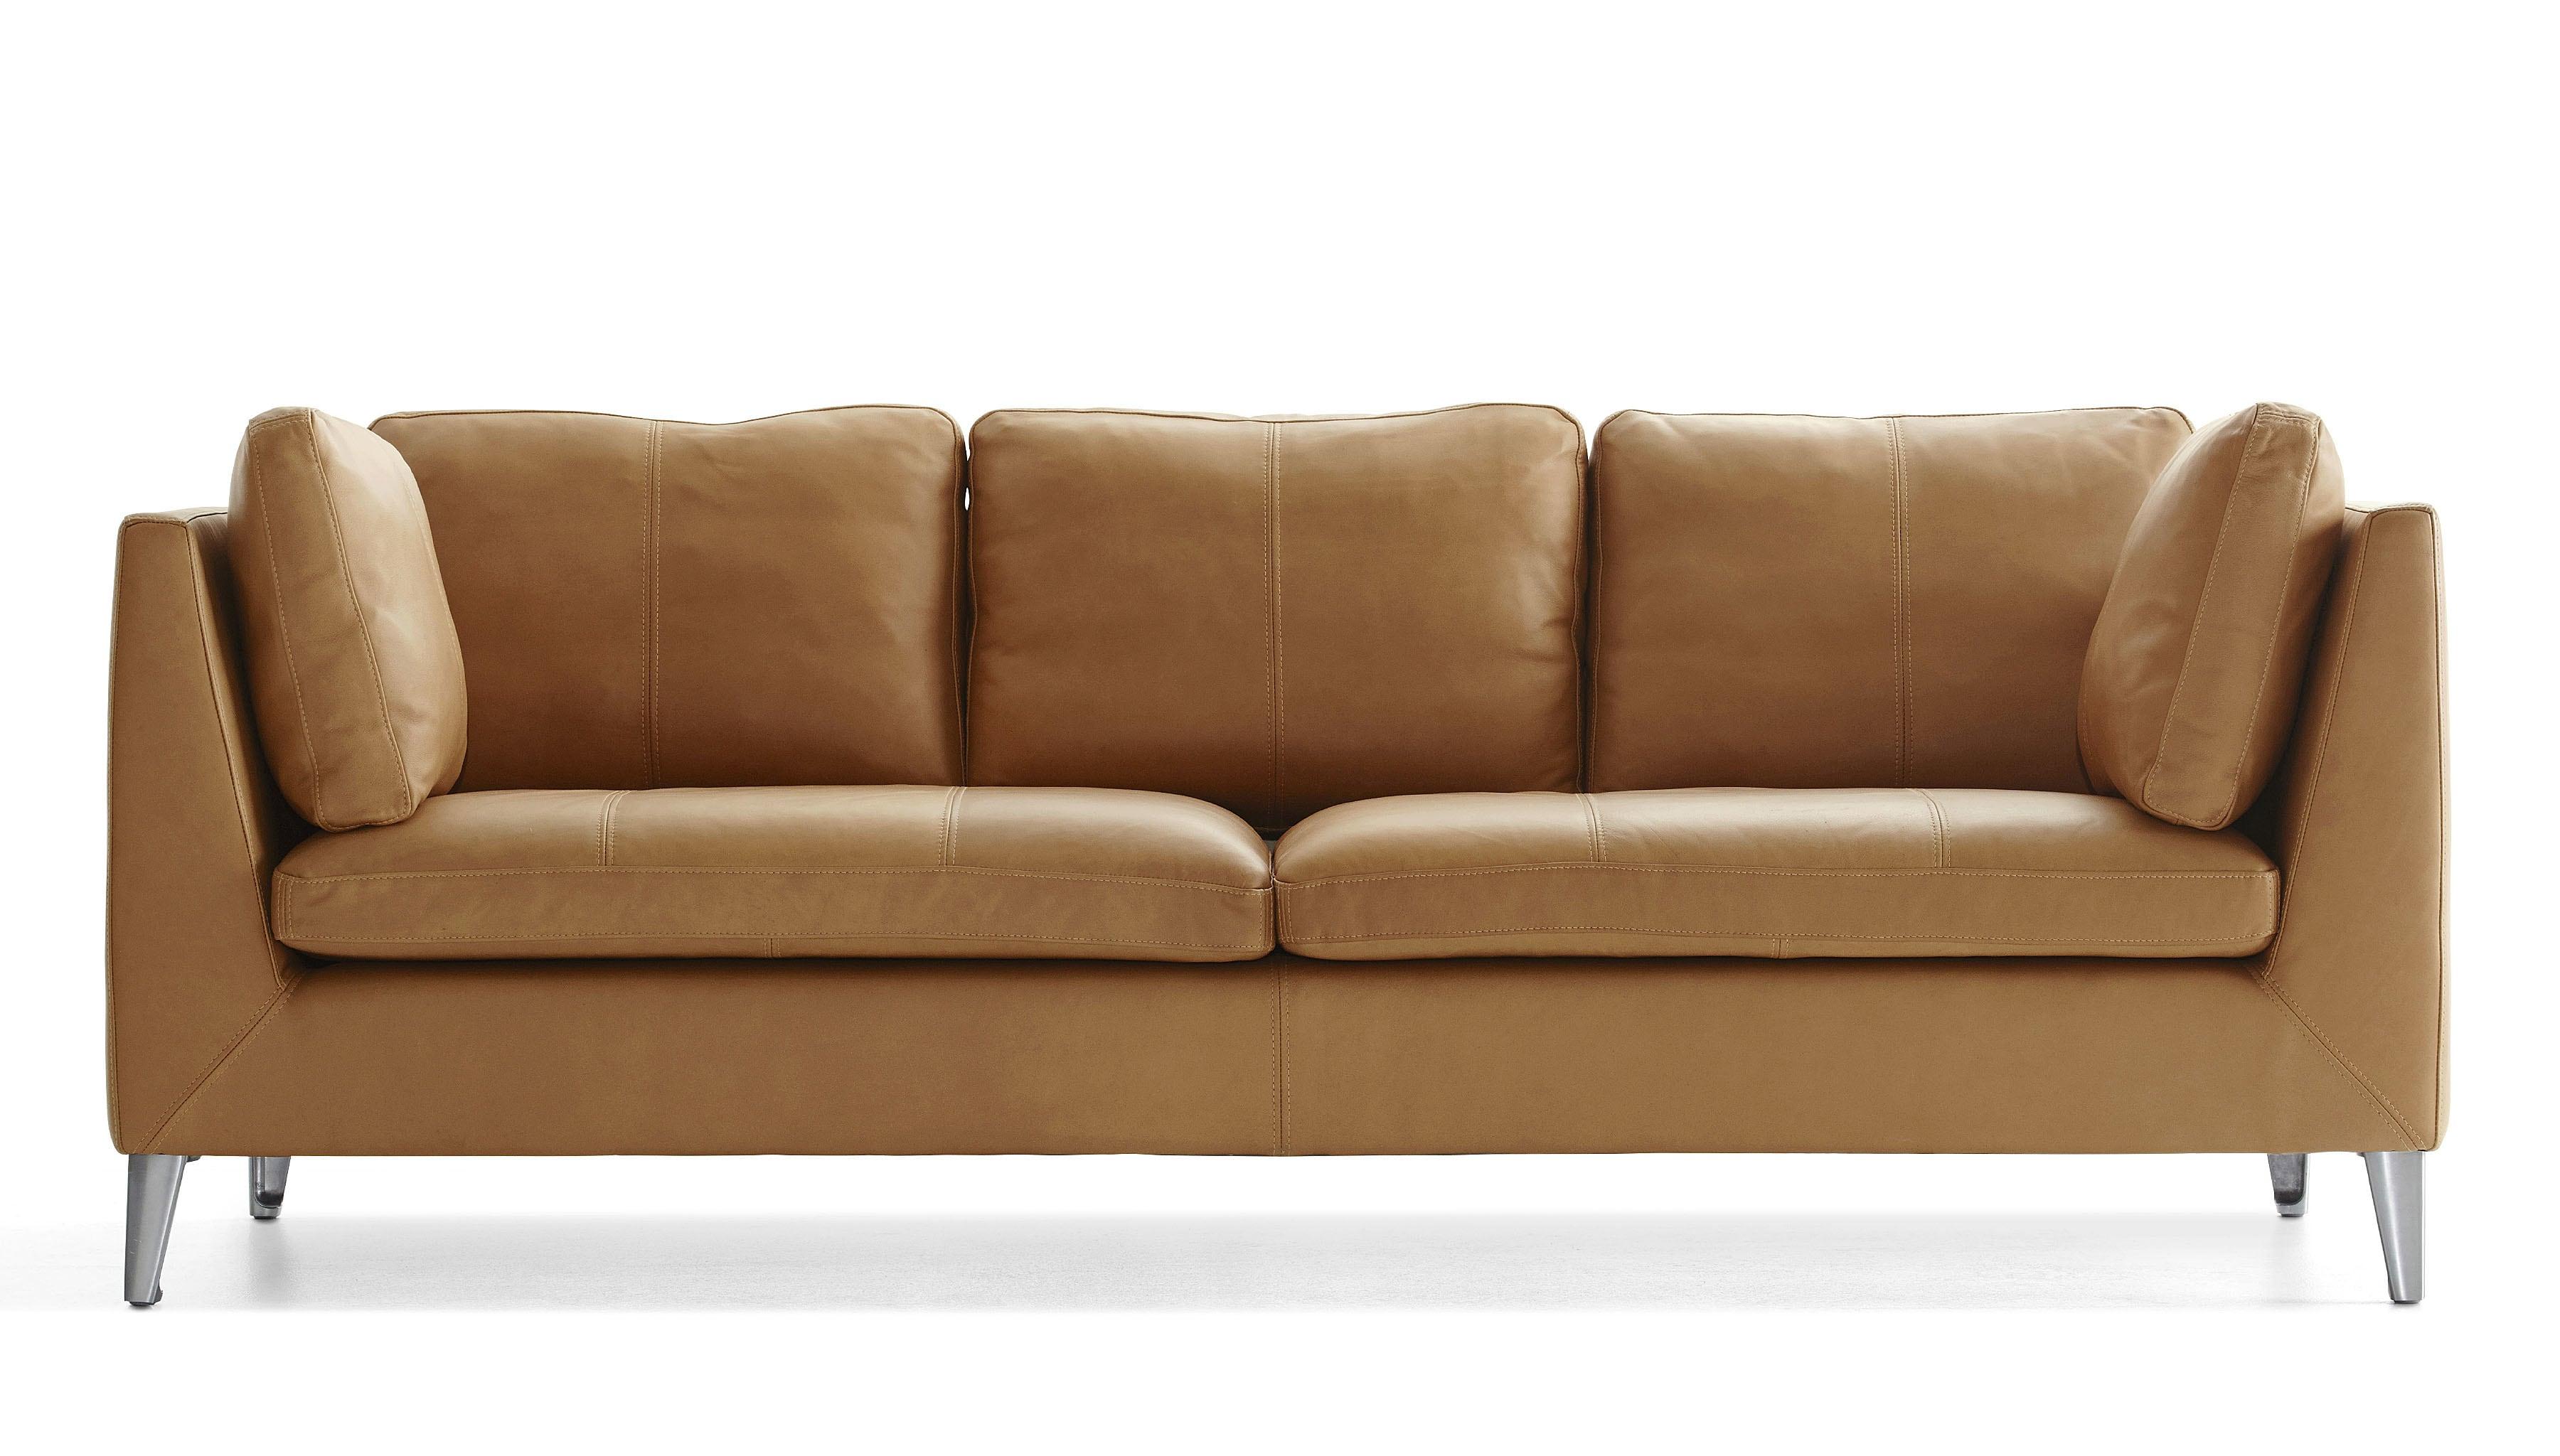 Sofa nordico Barato Q5df sofà S Y Sillones Pra Online Ikea